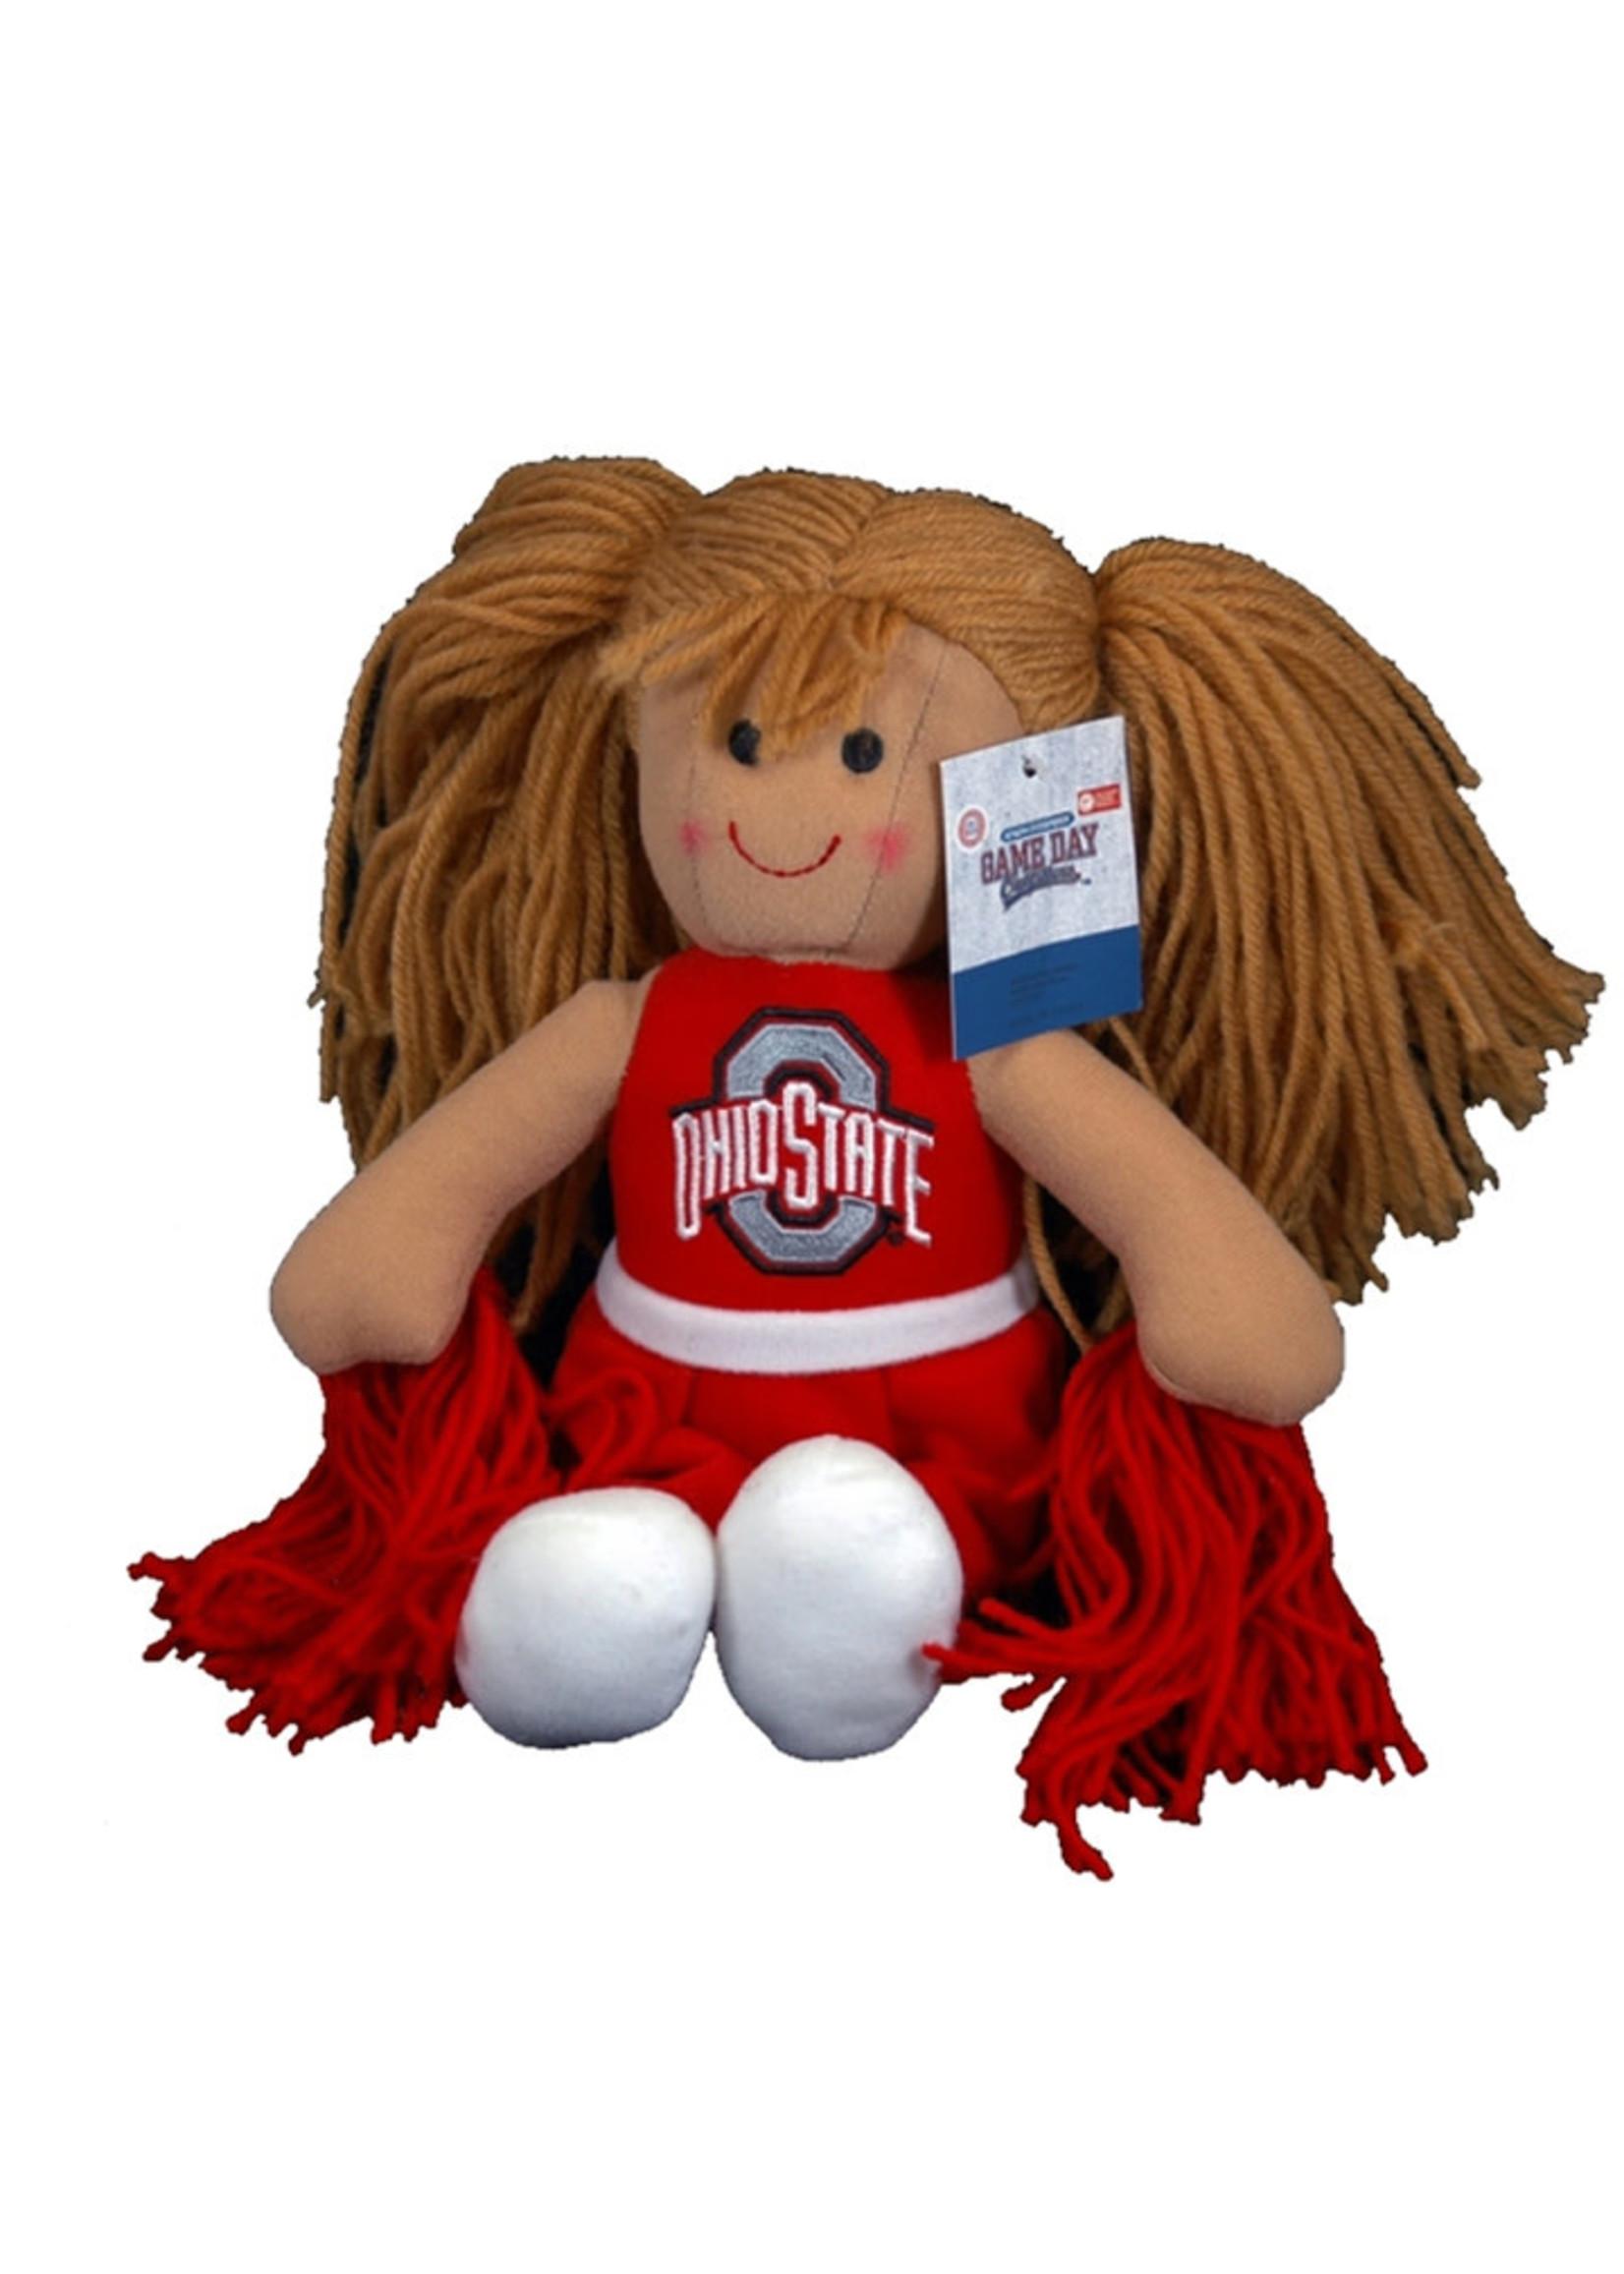 Ohio State Buckeyes Plush Cheerleader Doll